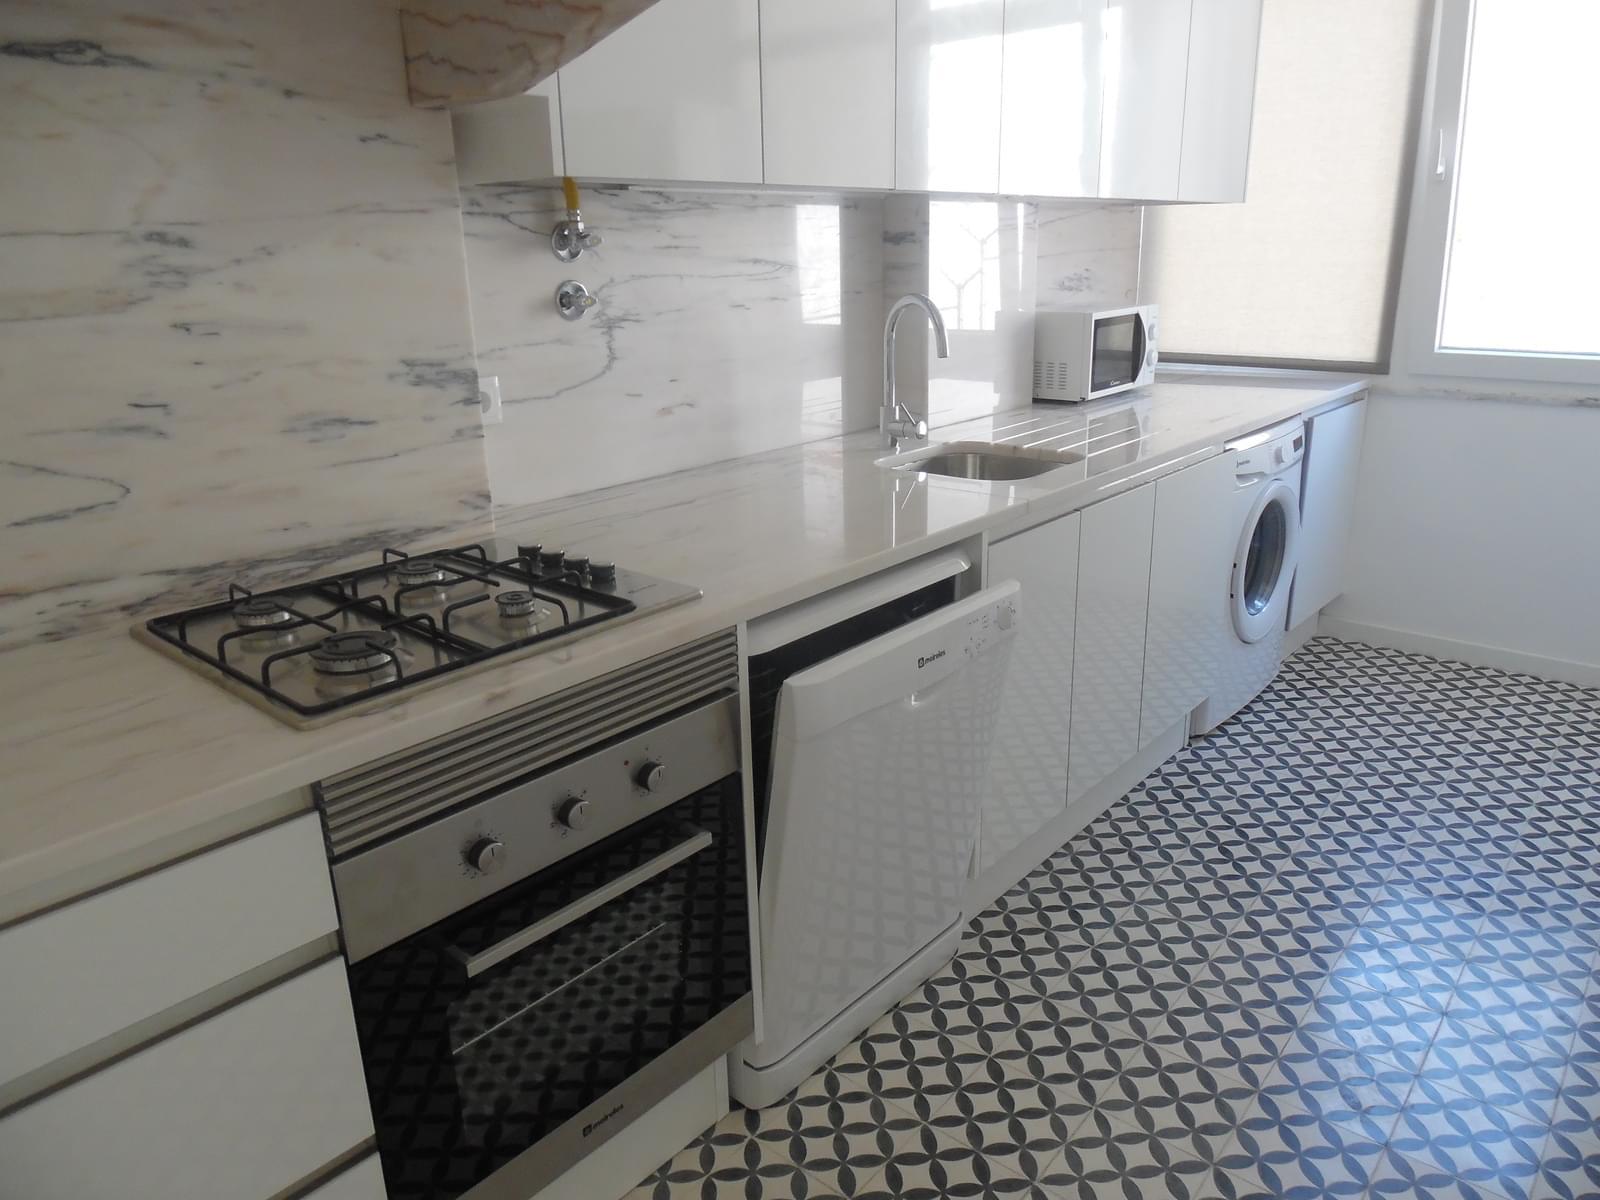 pf17256-apartamento-t2-lisboa-eb9ed194-da7d-4366-b837-c634c9d98aa2